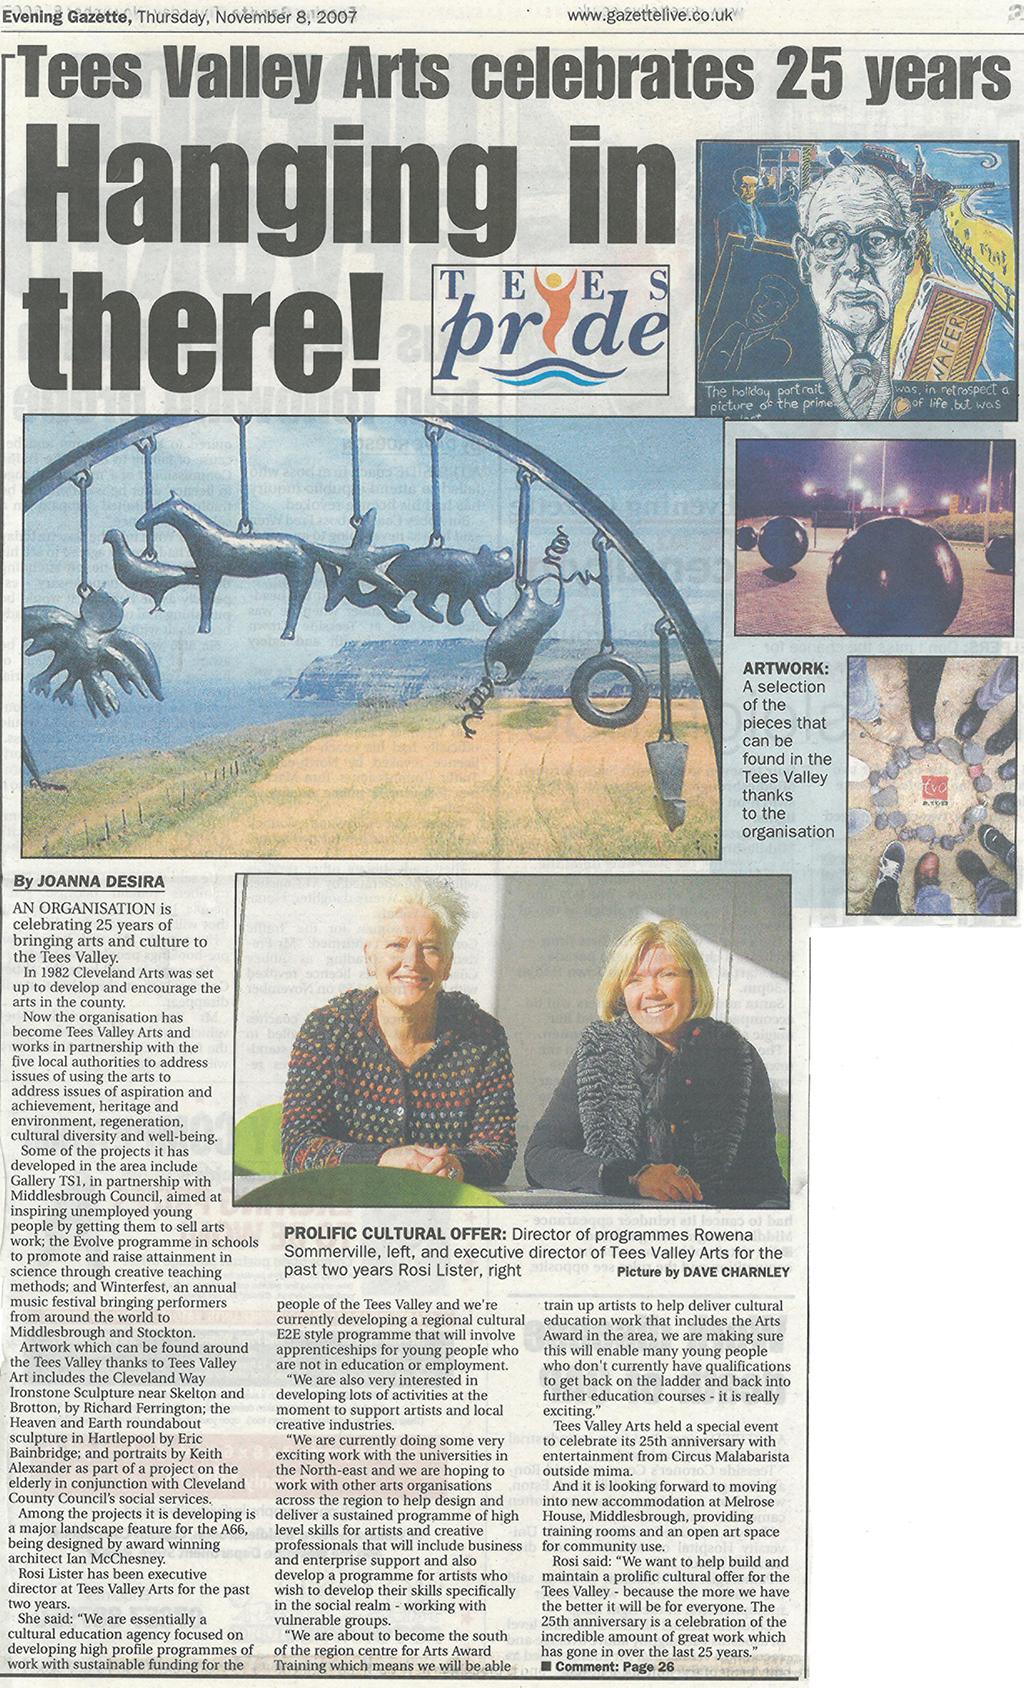 2007-11-08, evening gazette 01